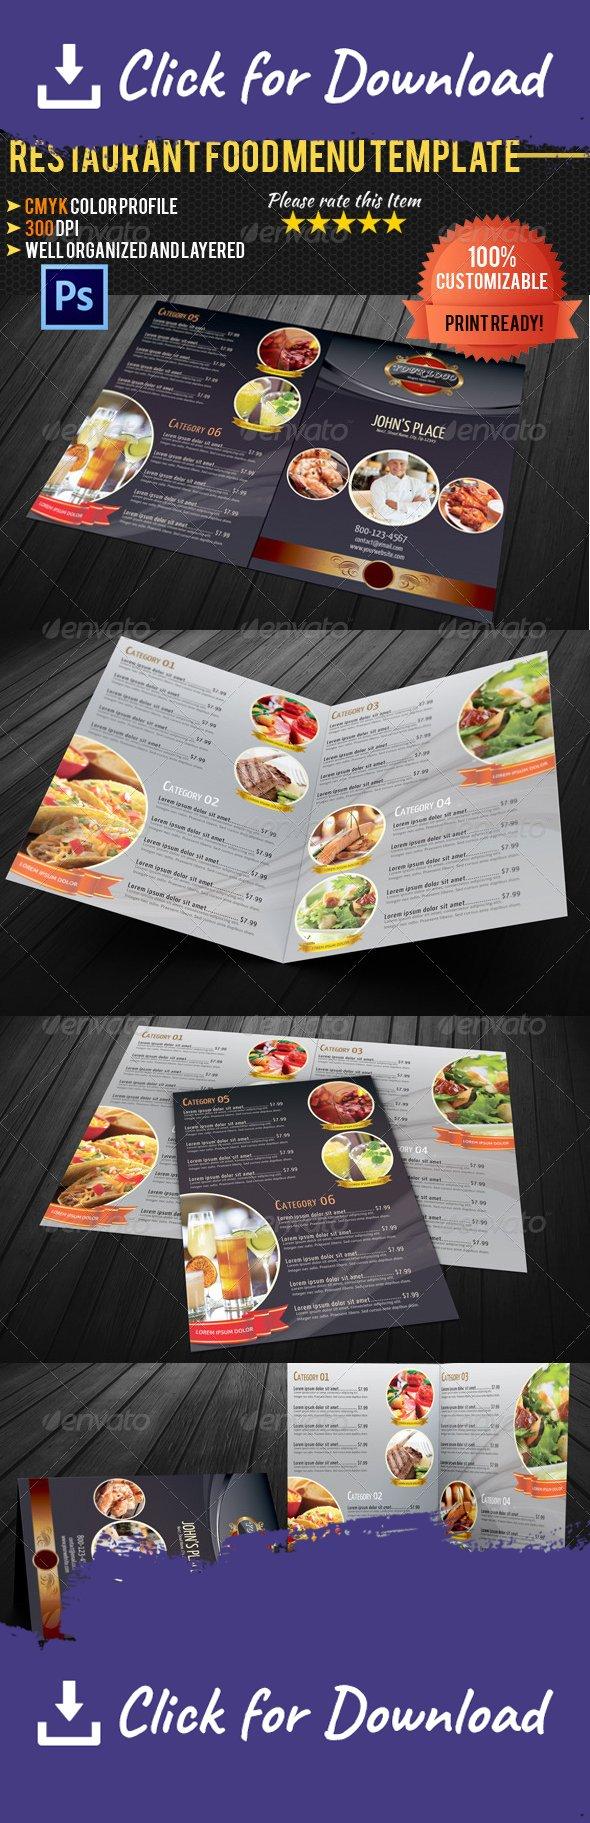 Bi-fold Restaurant Food Menu Template | Food menu template, Food ...